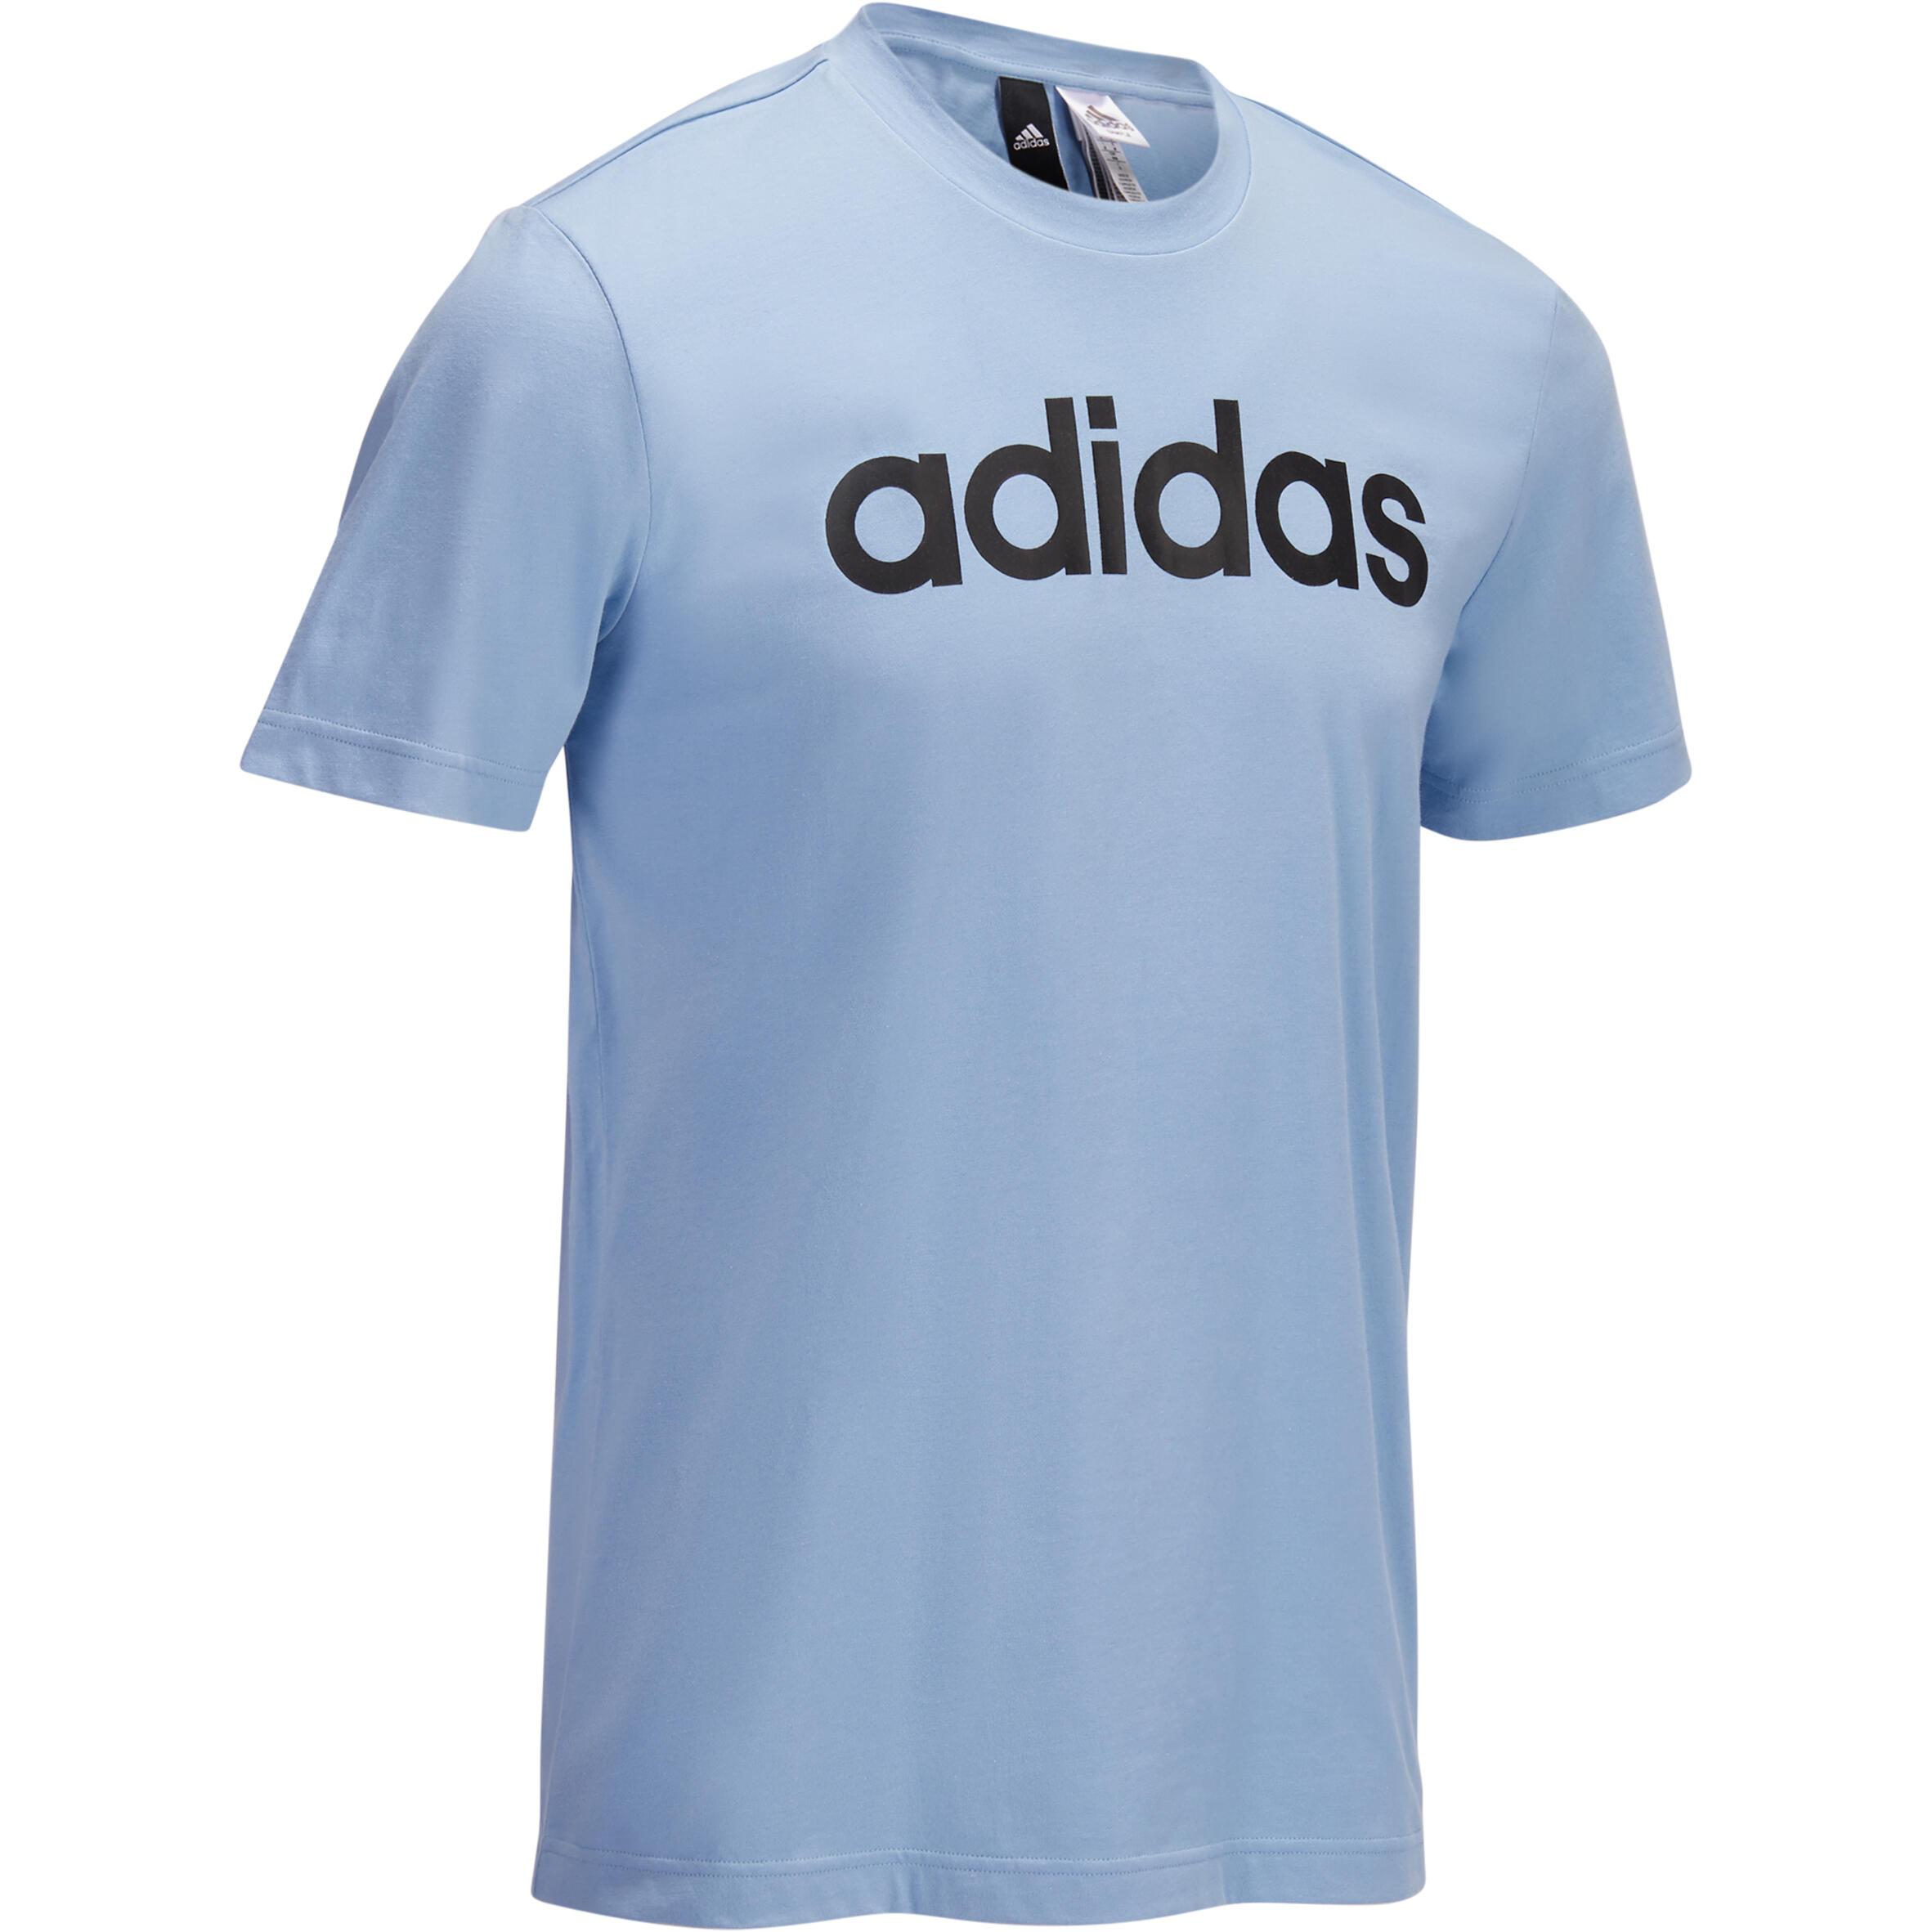 Adidas Heren T-shirt Adidas voor gym en pilates grafisch logo blauw